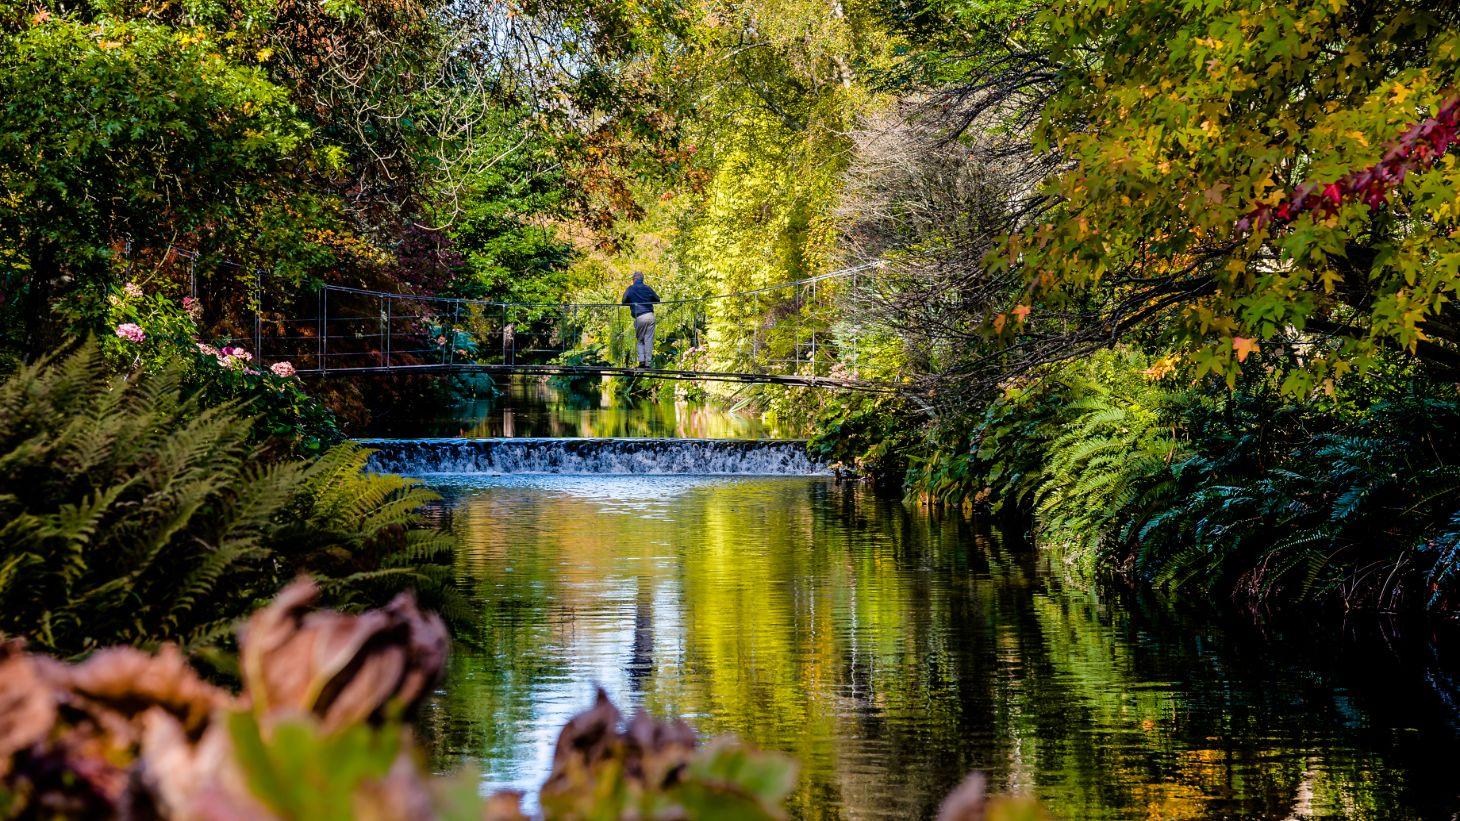 Visit the serene Mount Usher Gardens in Ashford, Co. Wicklow.